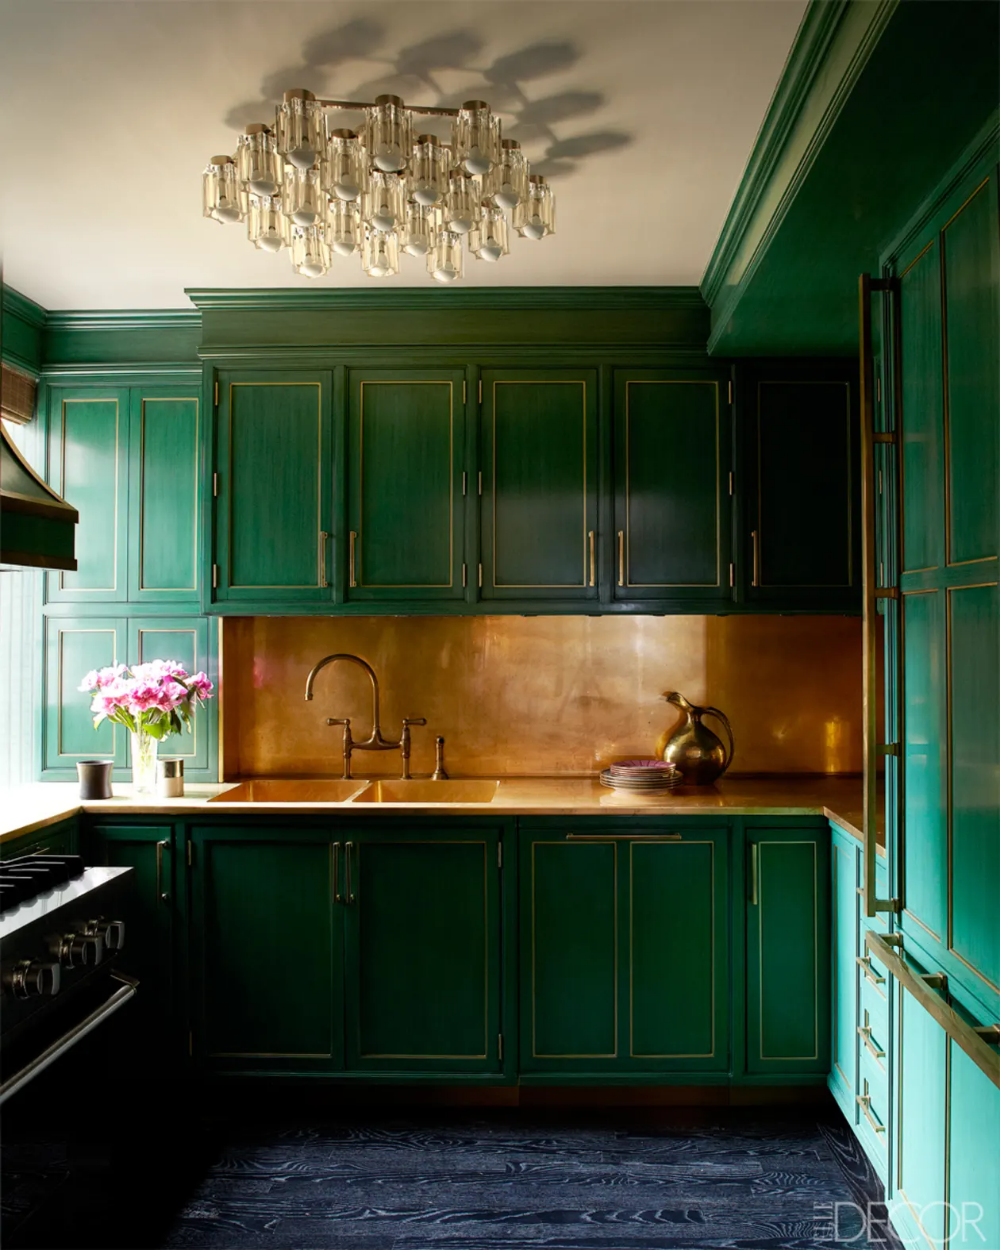 Cameron Diaz S Manhattan Kitchen Is A Gorgeous Little Jewel Box In 2020 Green Kitchen Cabinets Kitchen Cabinet Interior Dark Green Kitchen